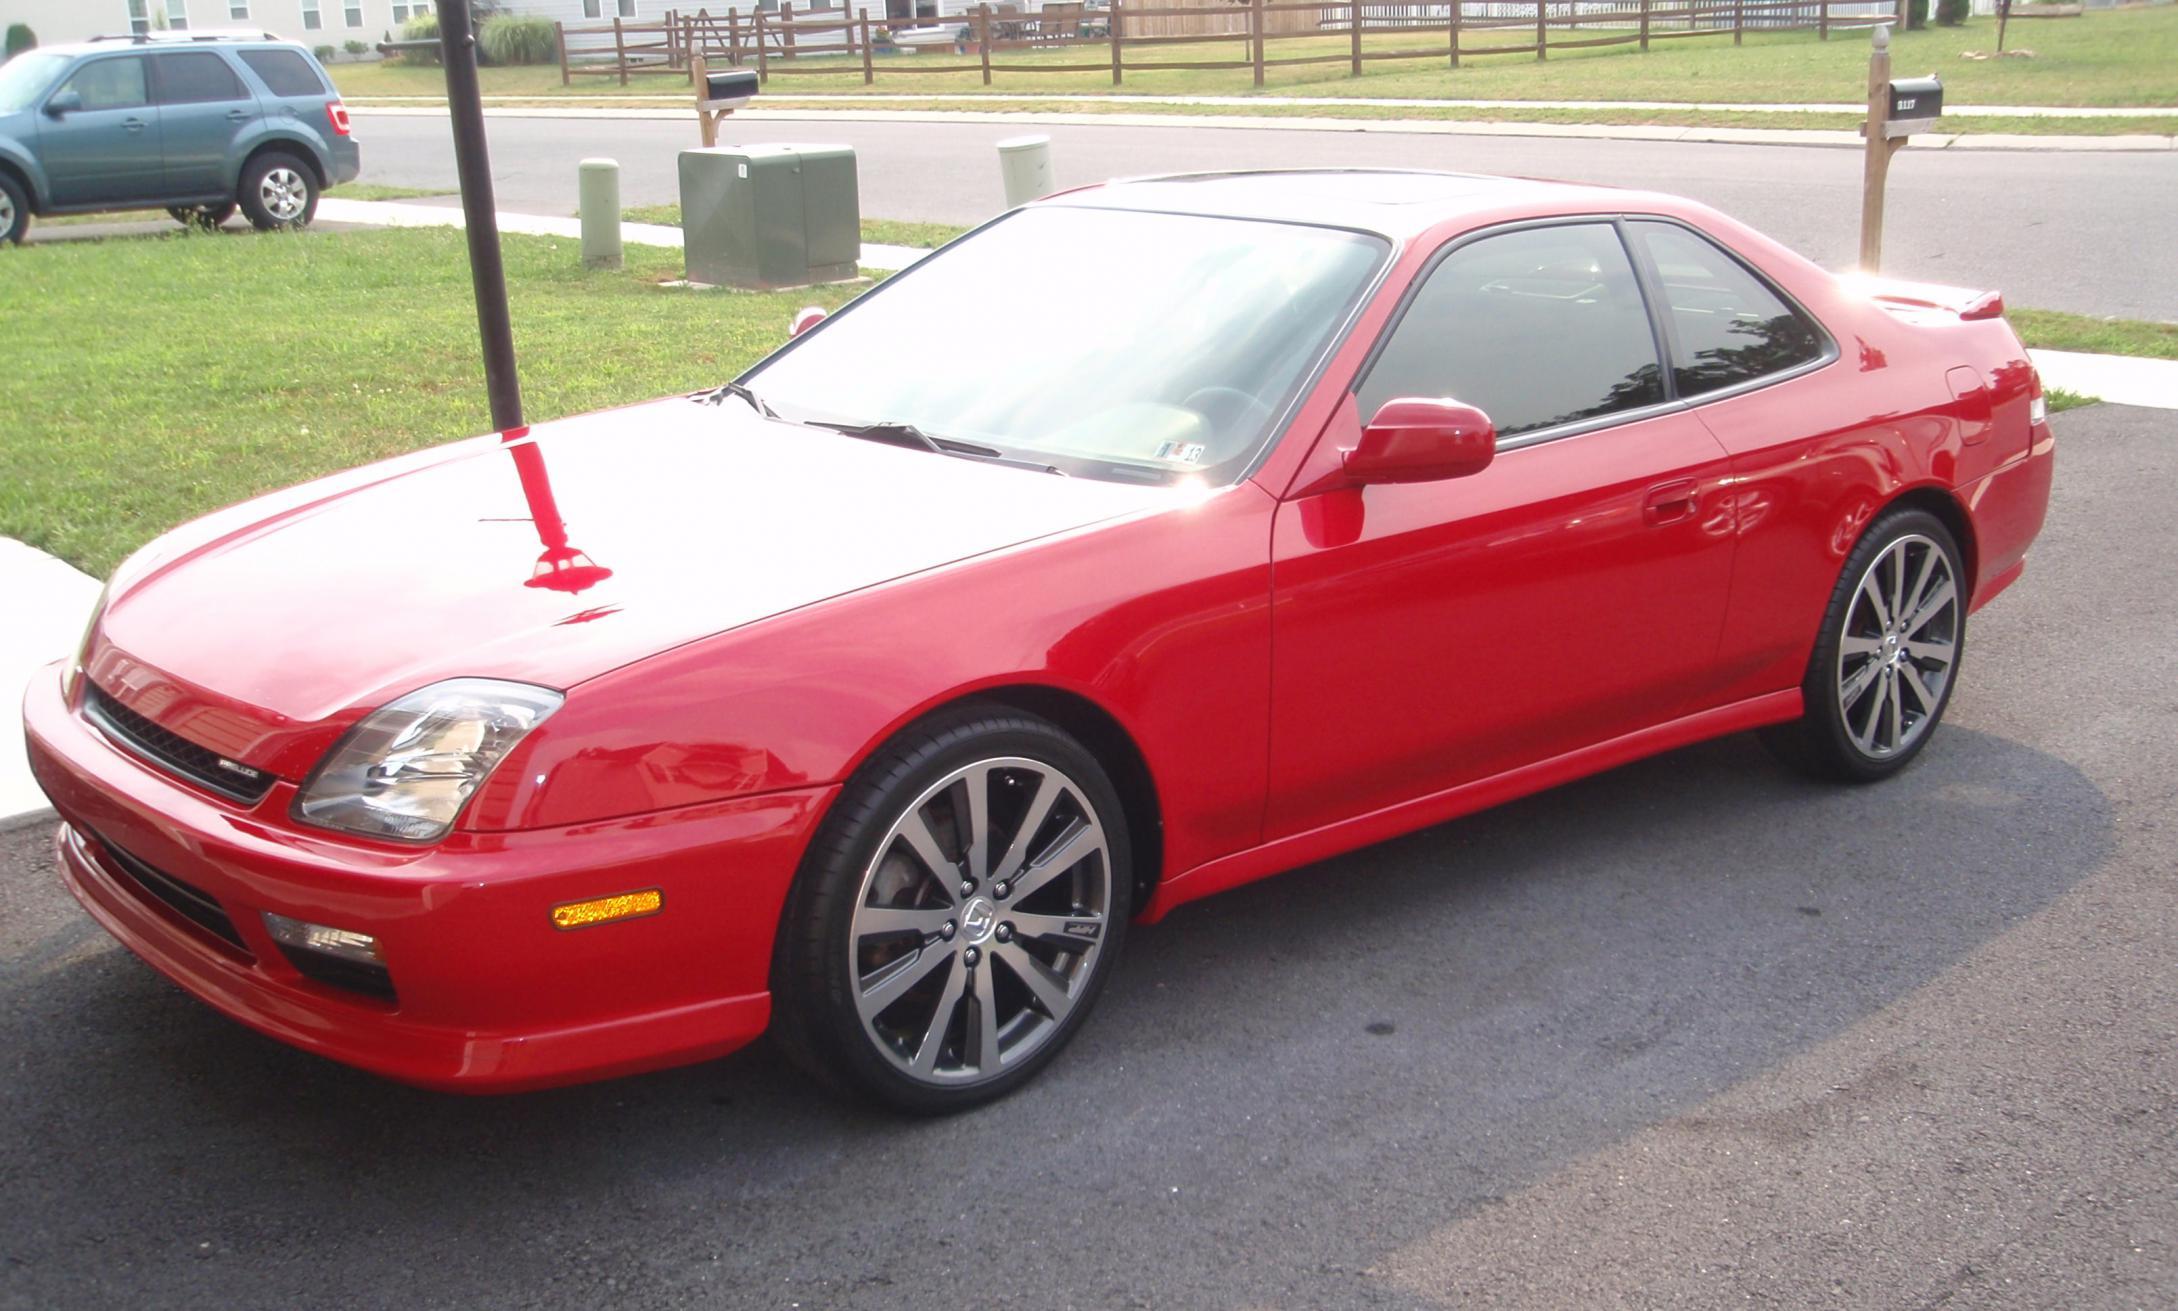 ... FS 2001 Honda Prelude SH Red 60k Manual VTECH-car1.jpg